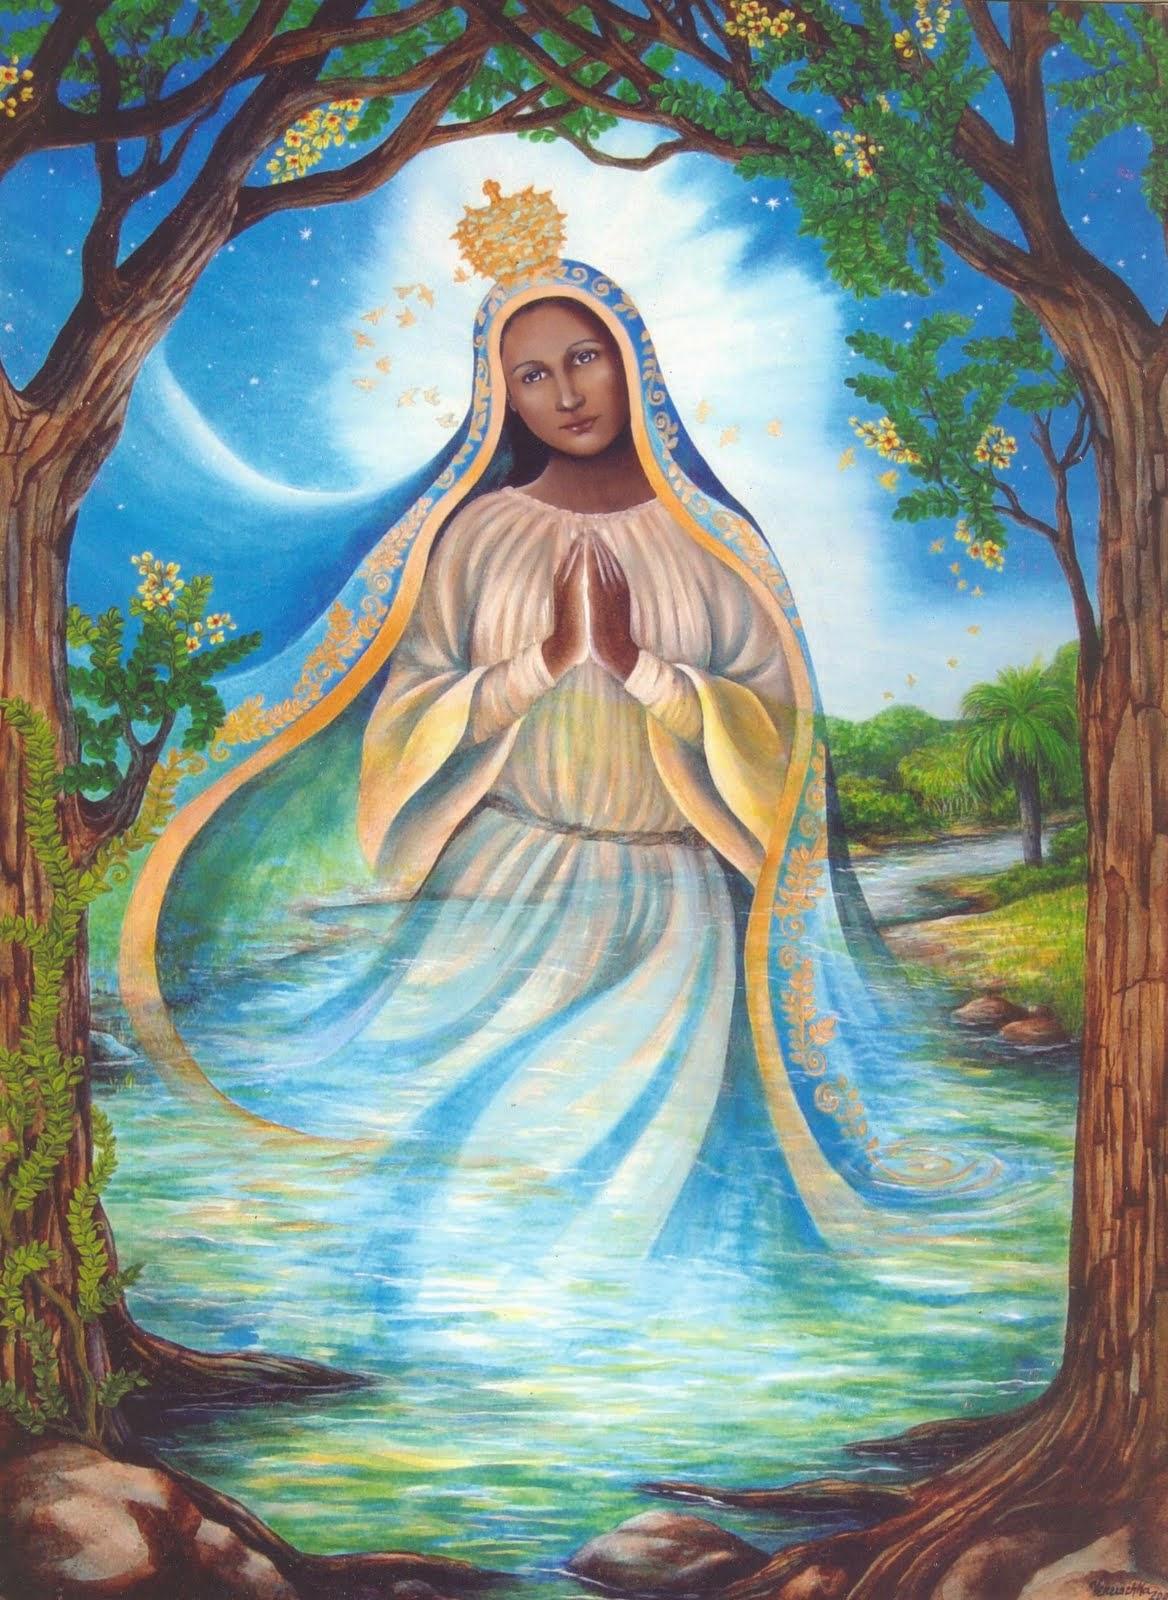 http://franciscanos.org.br/?p=25638